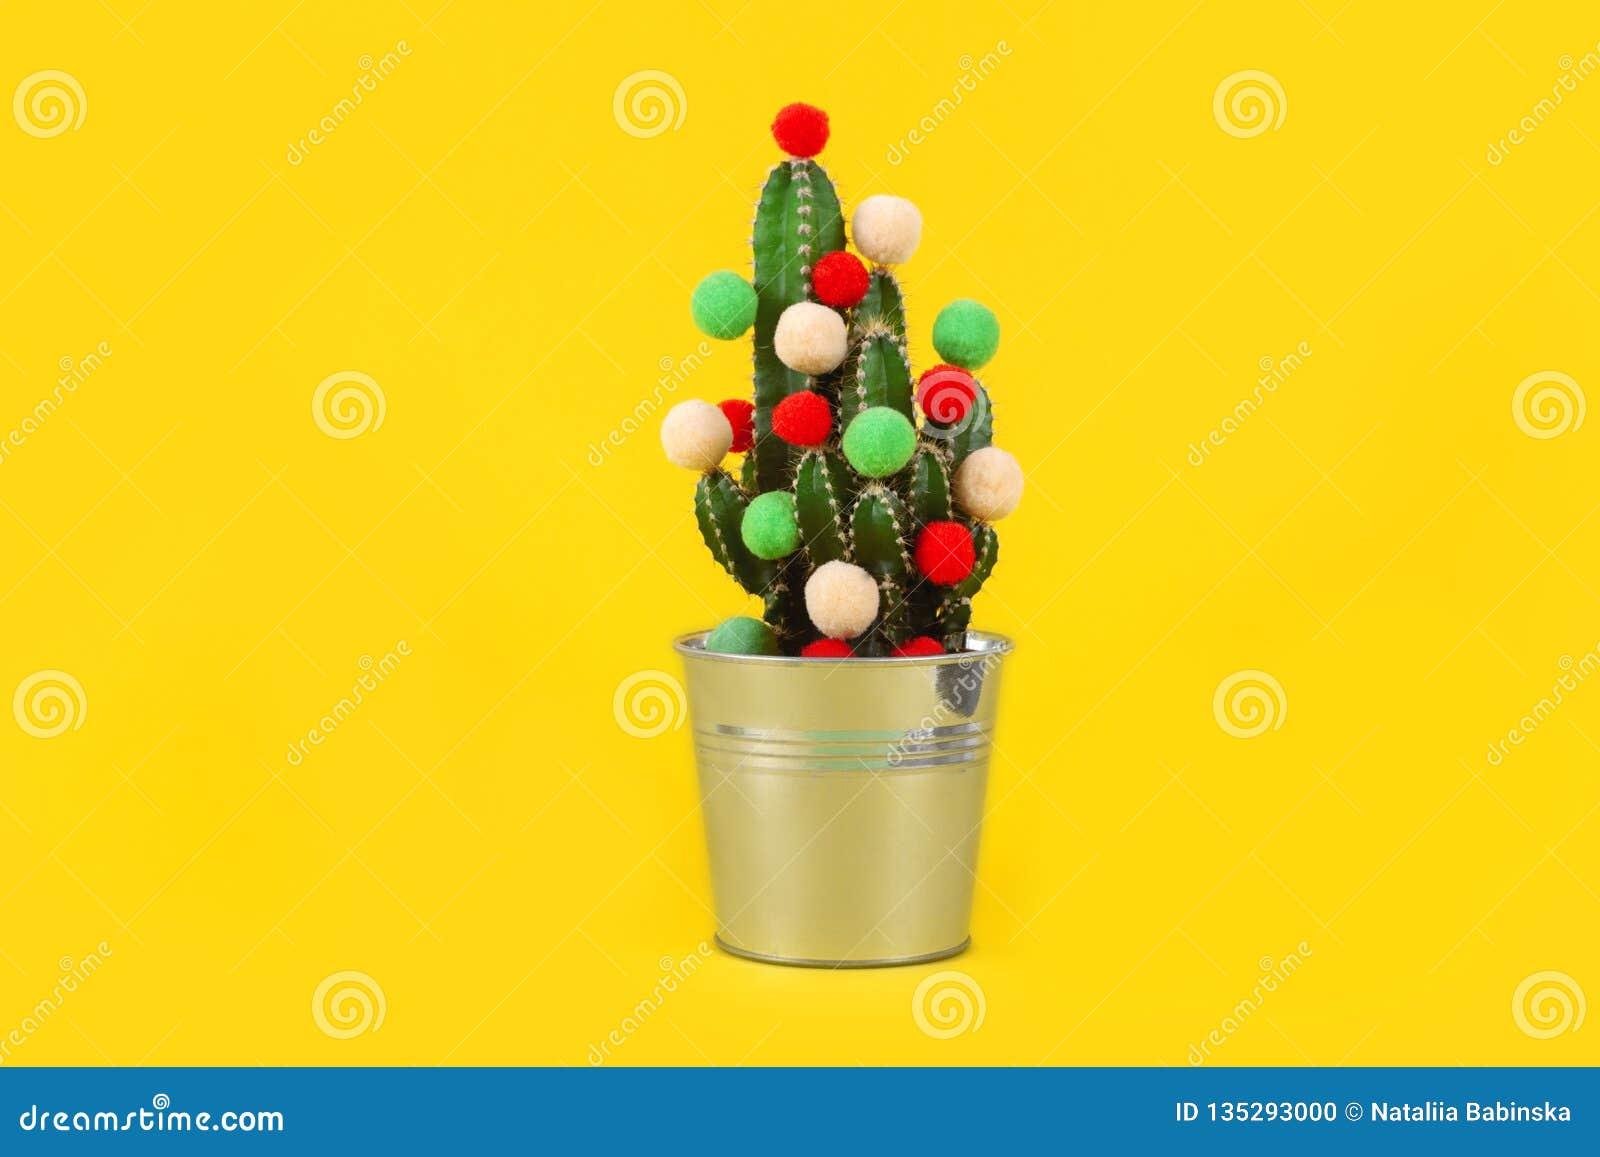 Seau Drole De Saint Valentin De Noel D Arbre De Cactus De Fond De